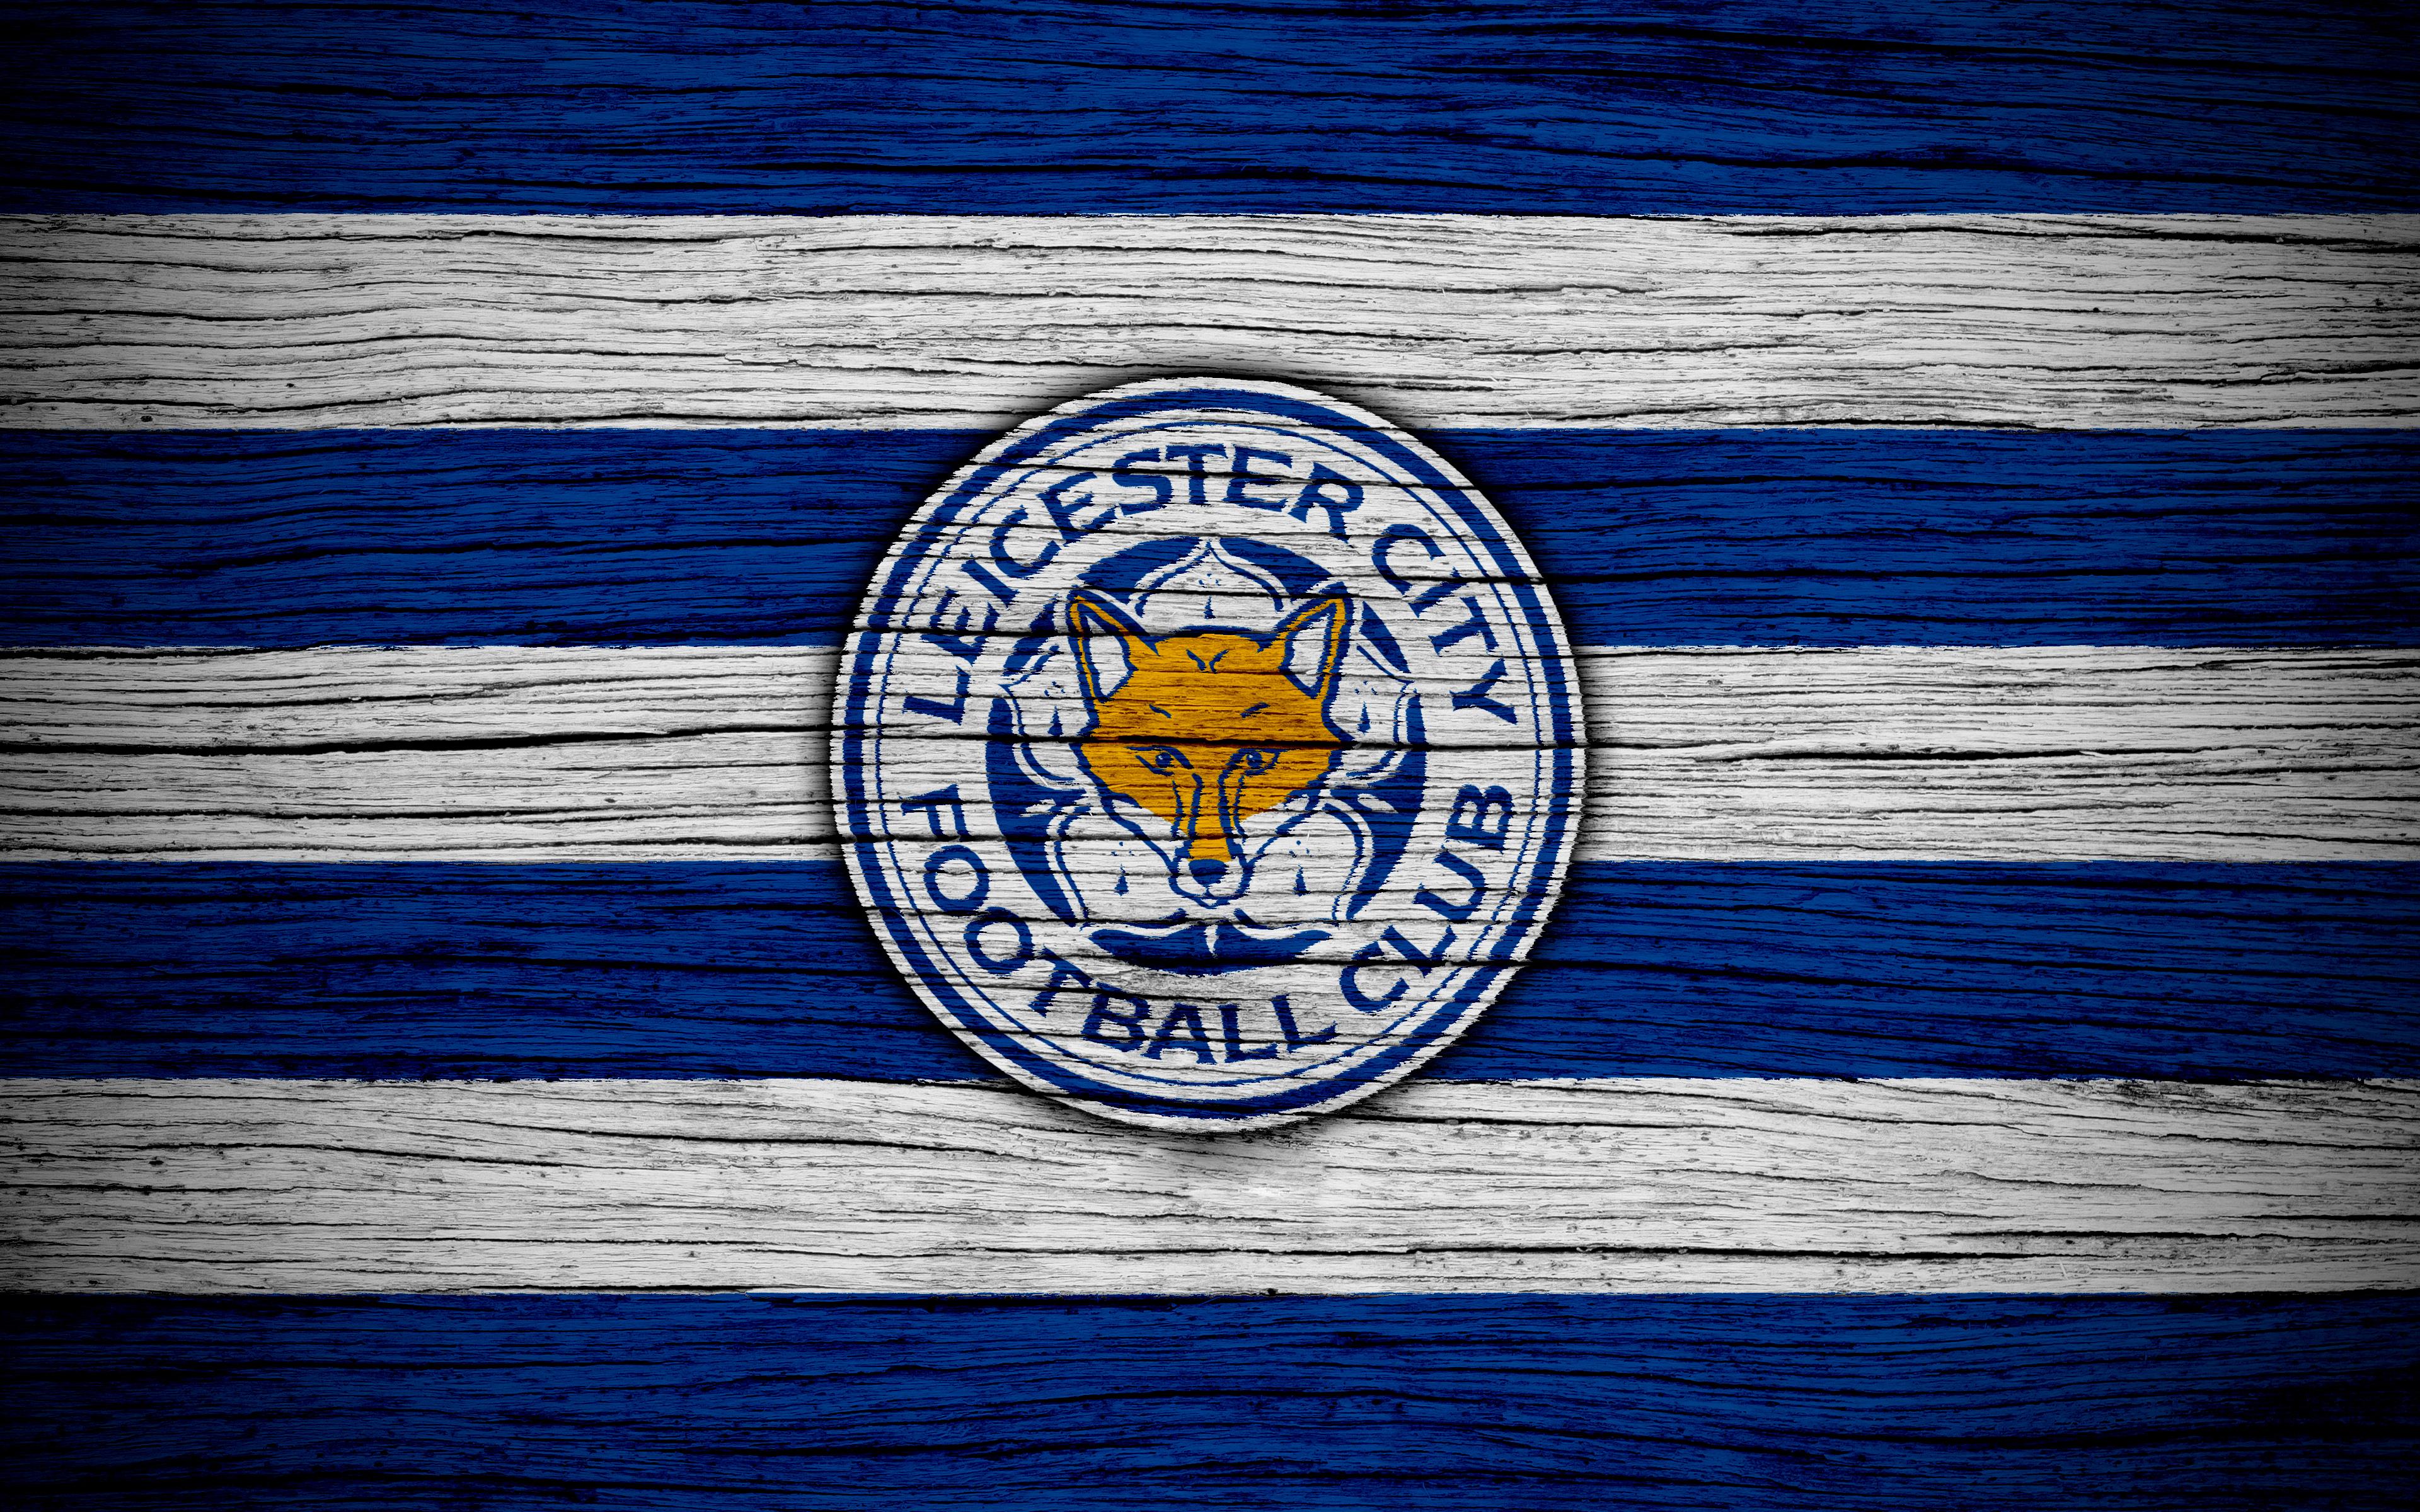 Leicester City F.C. 4k Ultra HD Wallpaper